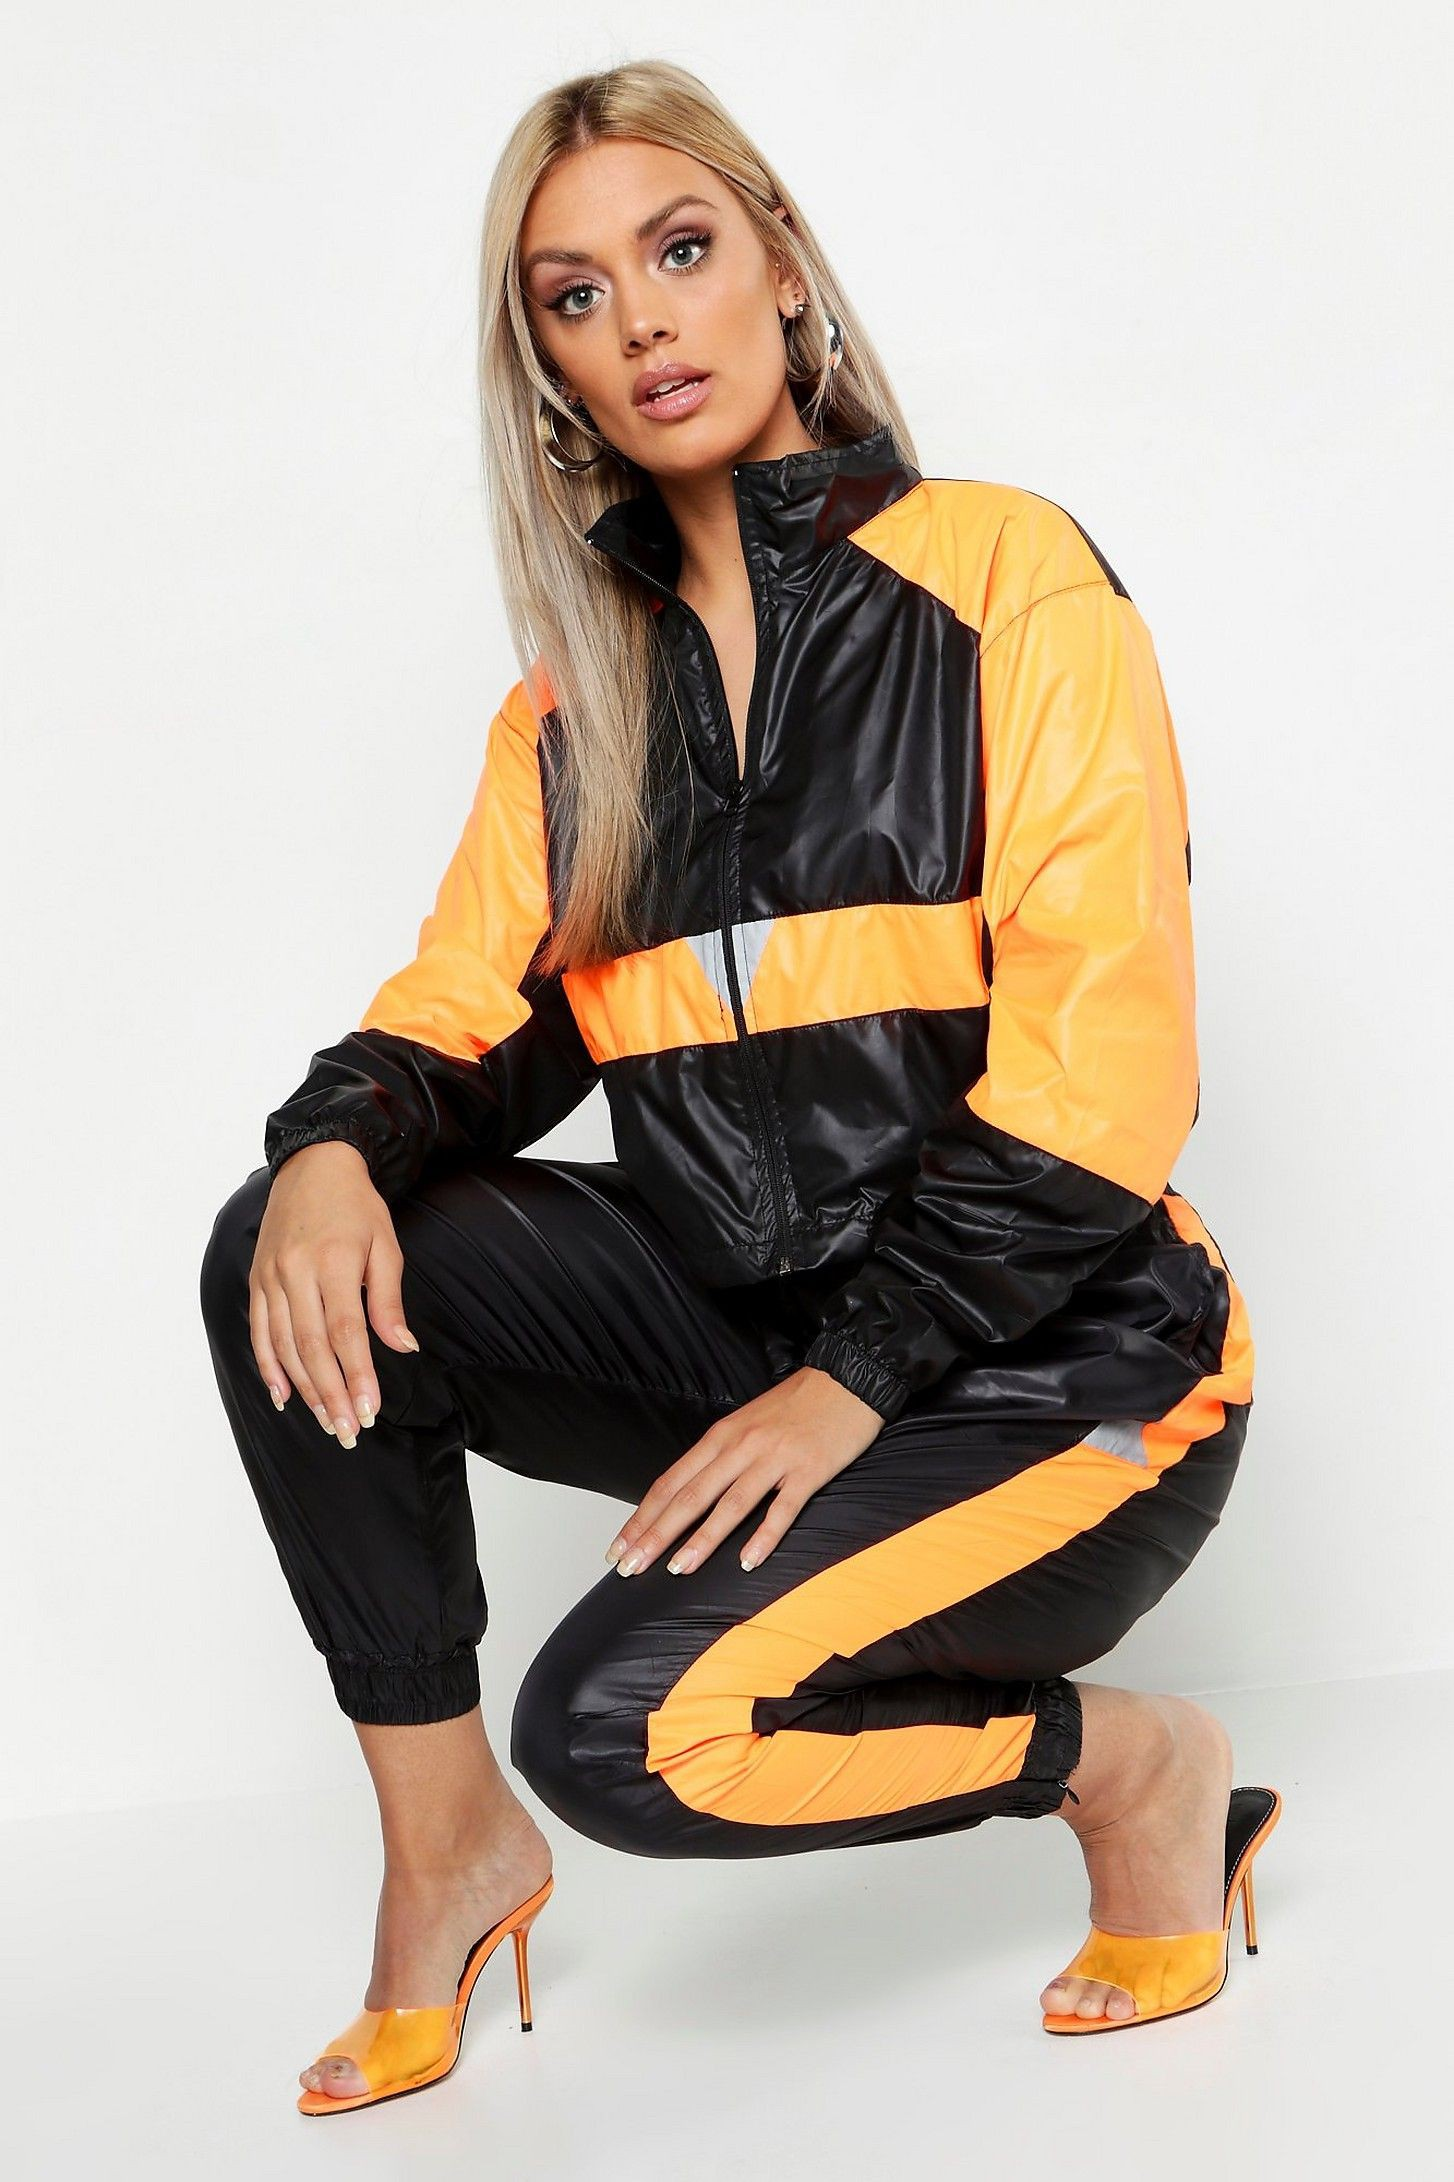 Discovery ideas on fashion model, Parachute pants